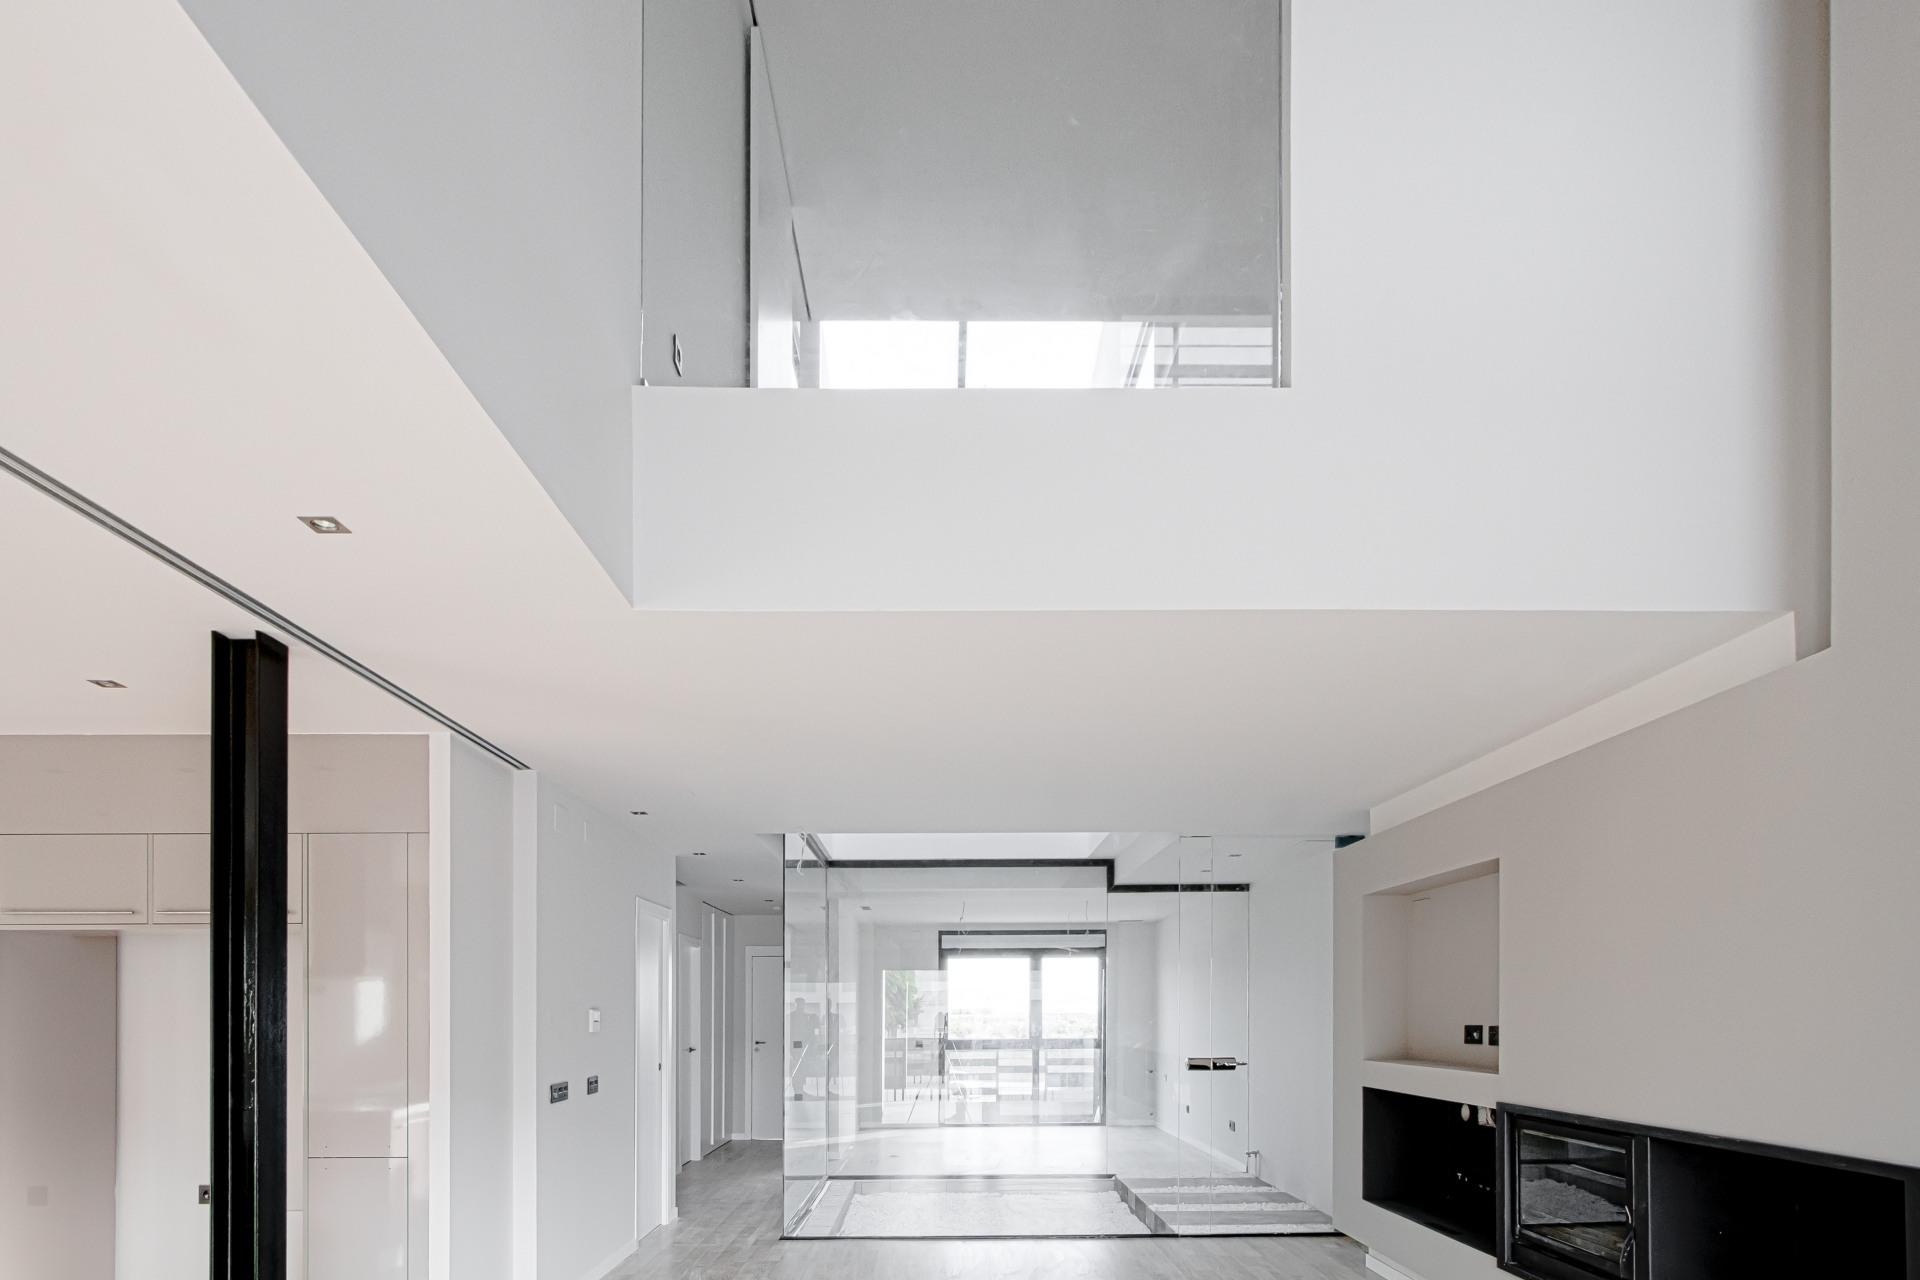 fotografia-arquitectura-valencia-german-cabo-viraje-v01 (5)